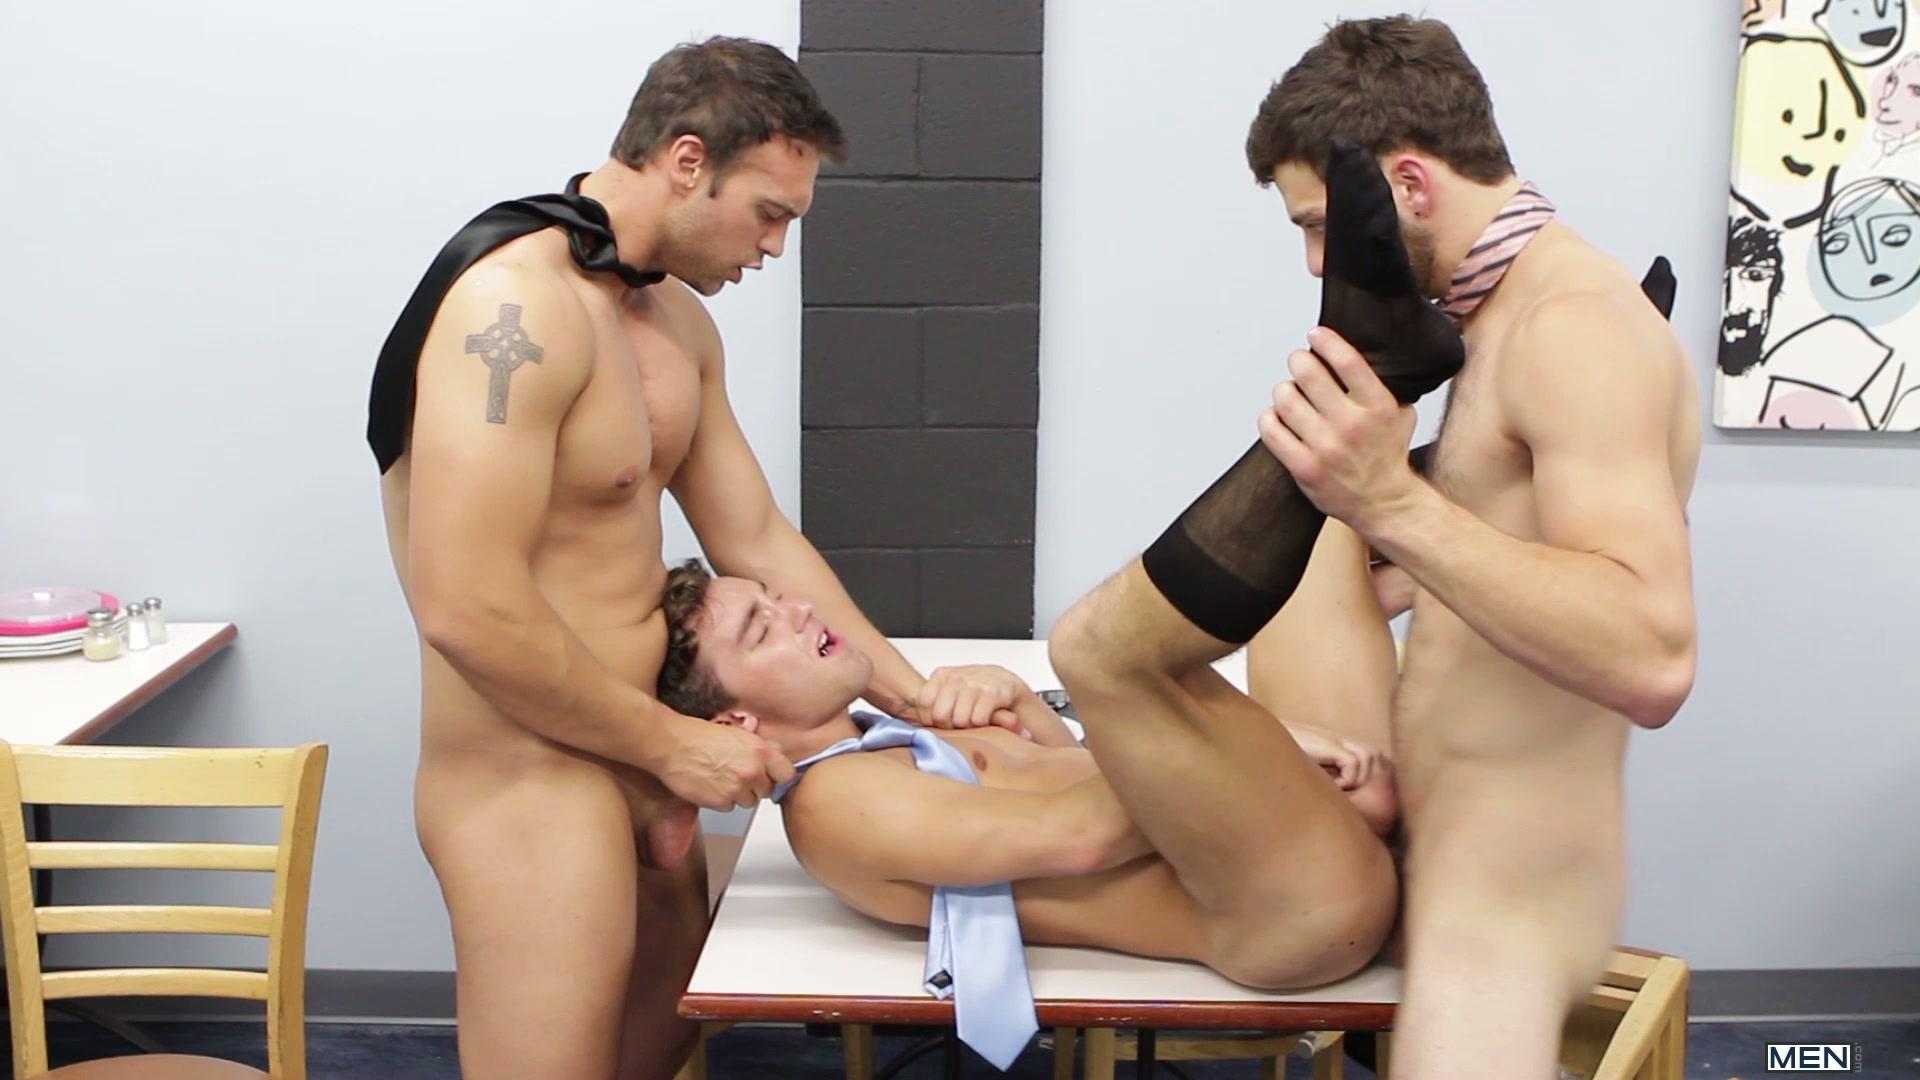 man uniform office Mature gay in